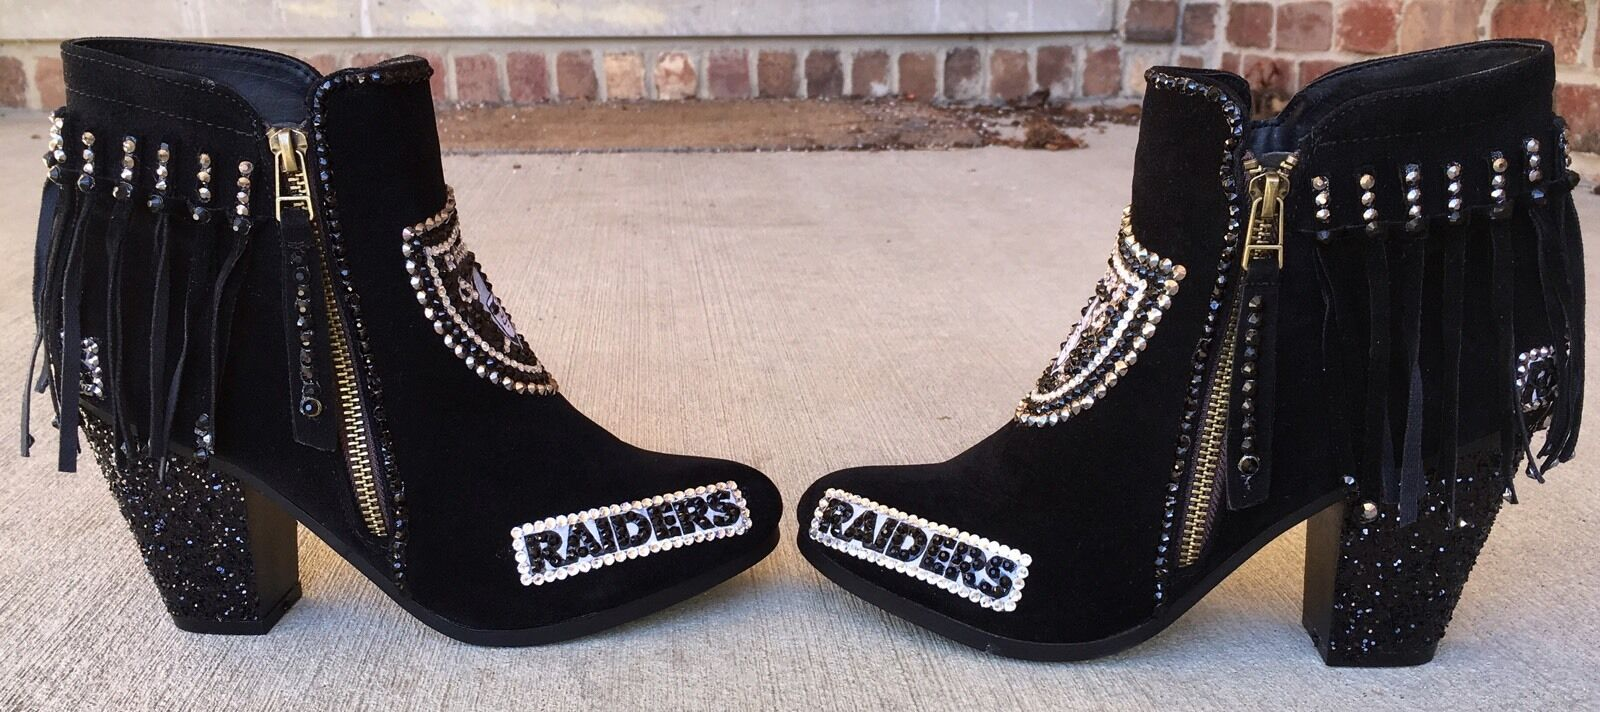 edizione limitata Oakland Raiders Raiders Raiders BRILLIANT avvioies  Custom MADE Any Team, Any Sport Sz6-10  grande vendita